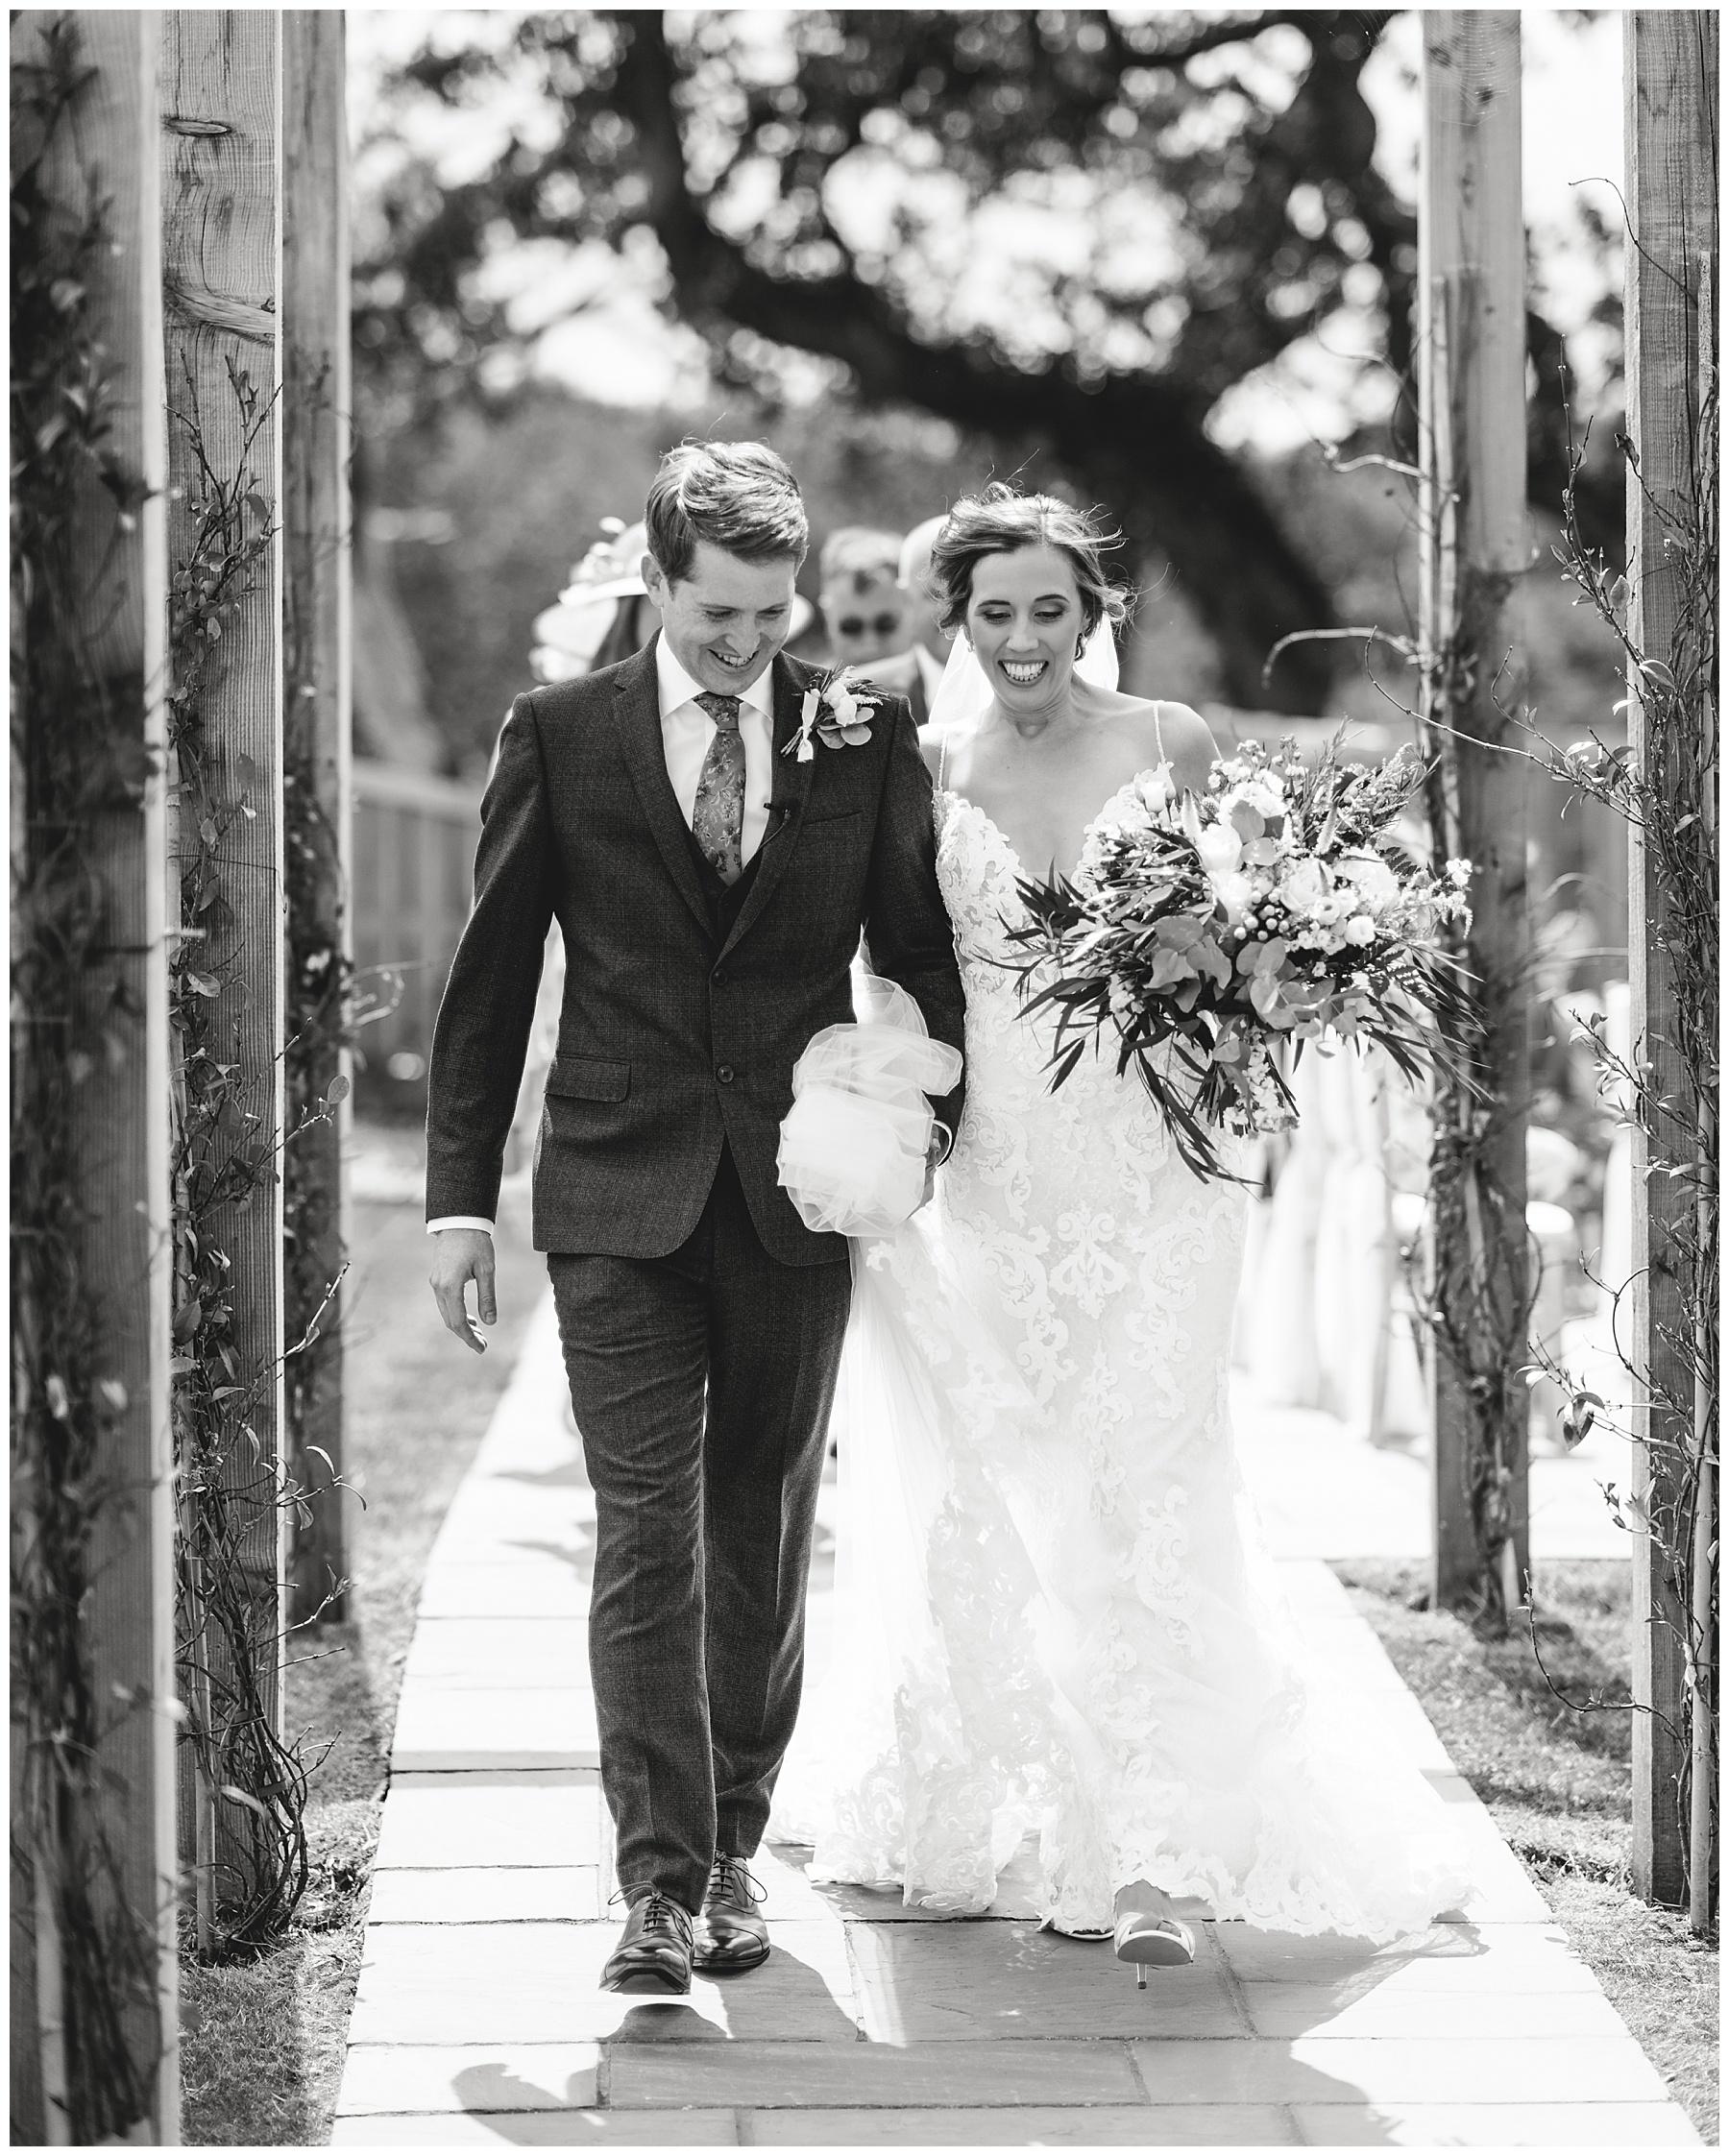 Outdoor Wedding Ceremony at Oldwalls